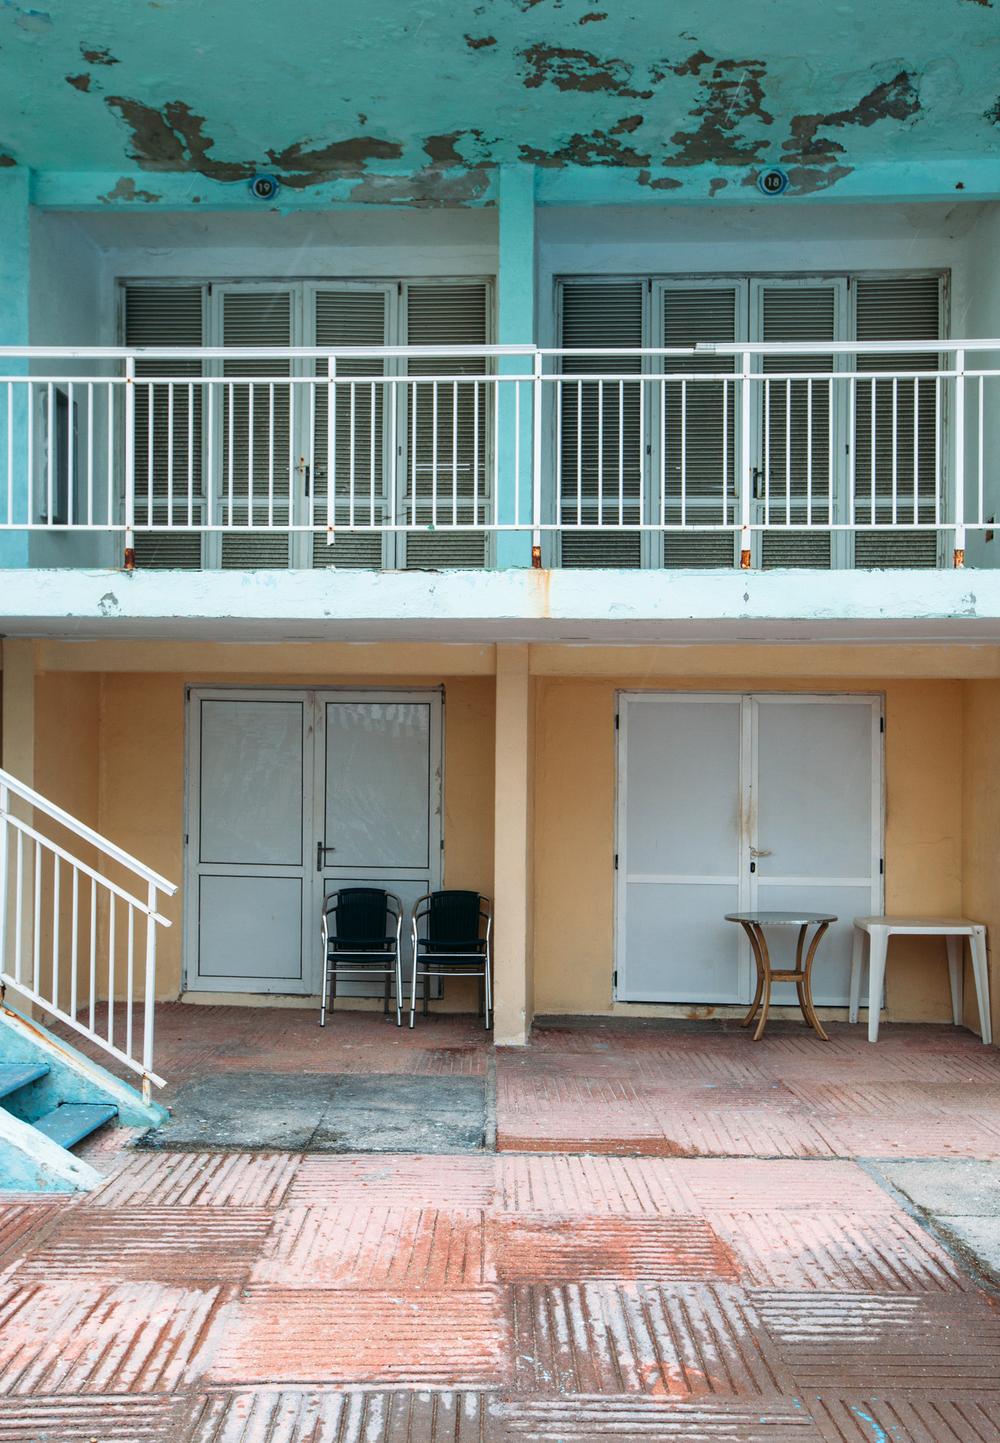 Julie_Cuba_Architecture_11.jpg